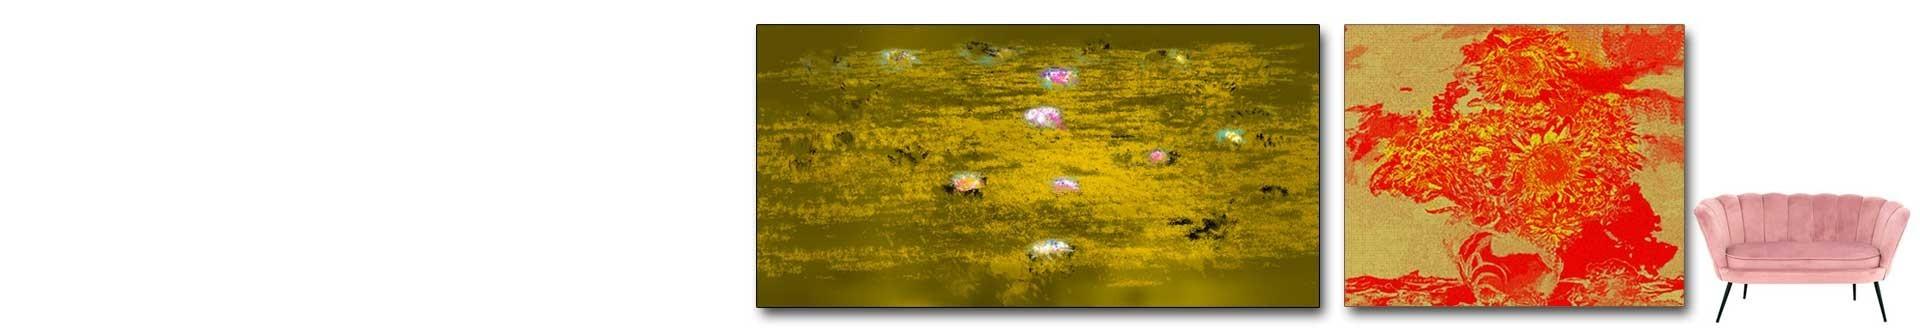 Złote obrazy • autorskie obrazy na ścianę • GRAFIKIOBRAZY.PL